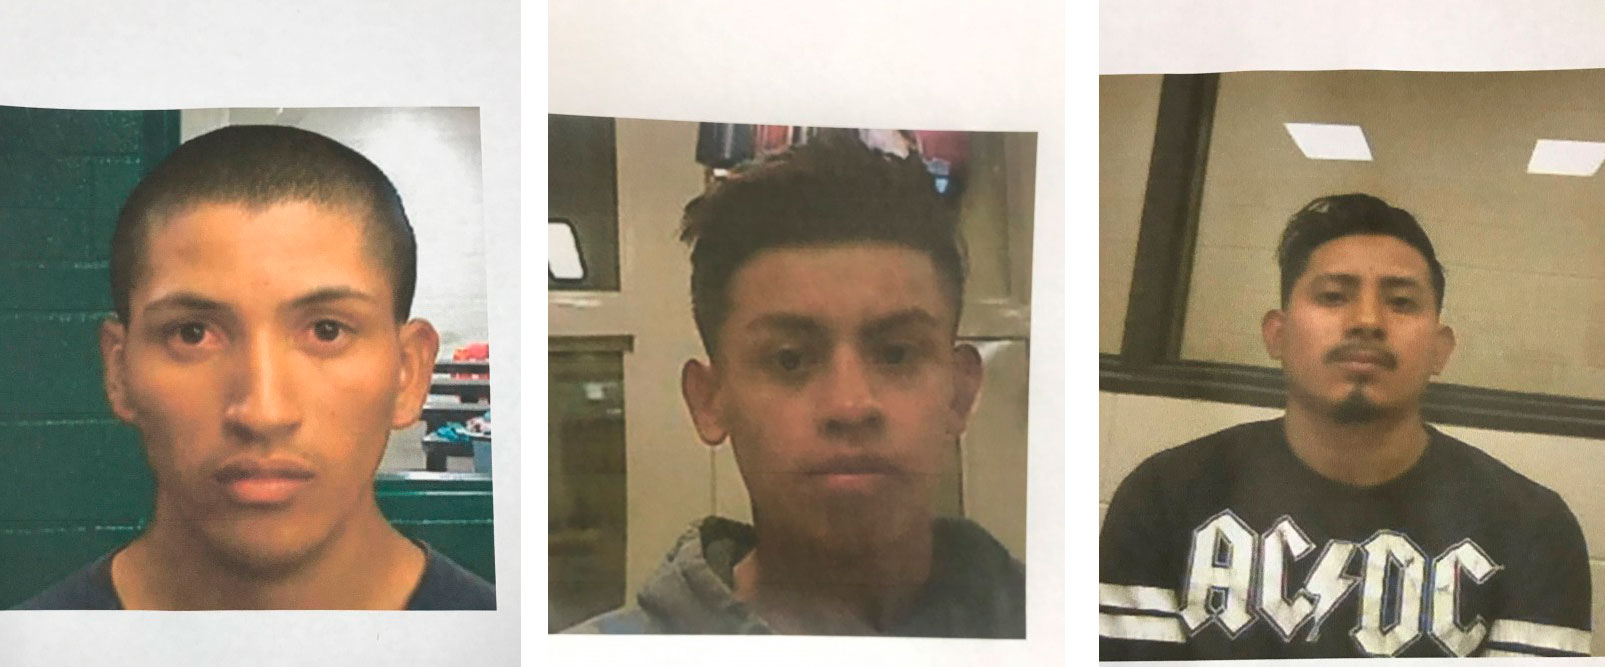 <p>18-year-old Douglas Amaya Arriaga from Honduras,18-year-old Carlos Perez-Rodriguez from Honduras and23-year-old Amilcar Aguilar-Hernandez from El Salvador.</p>